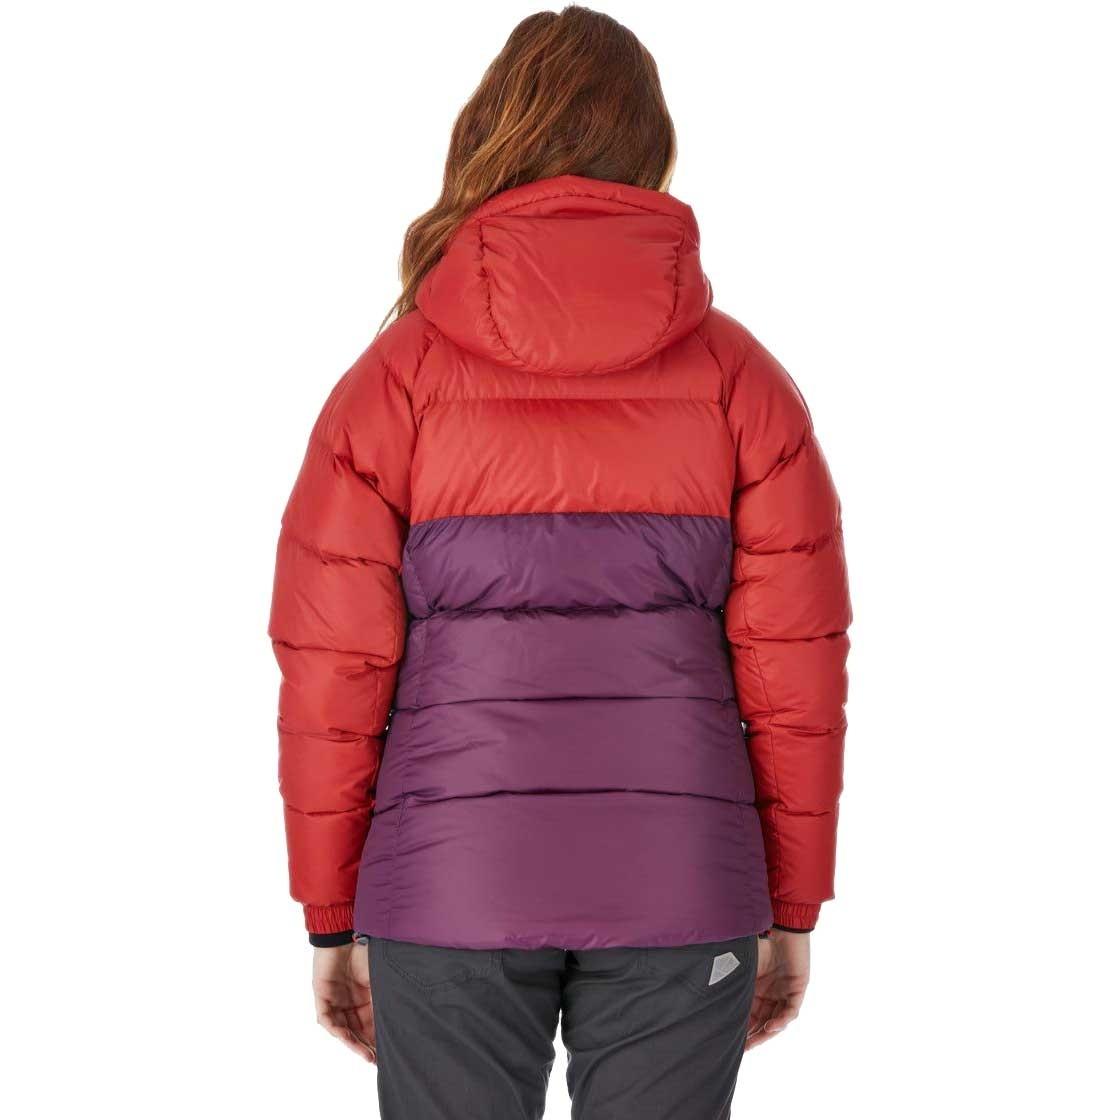 Rab Asylum Women's Down Jacket - Rust/Eggplant